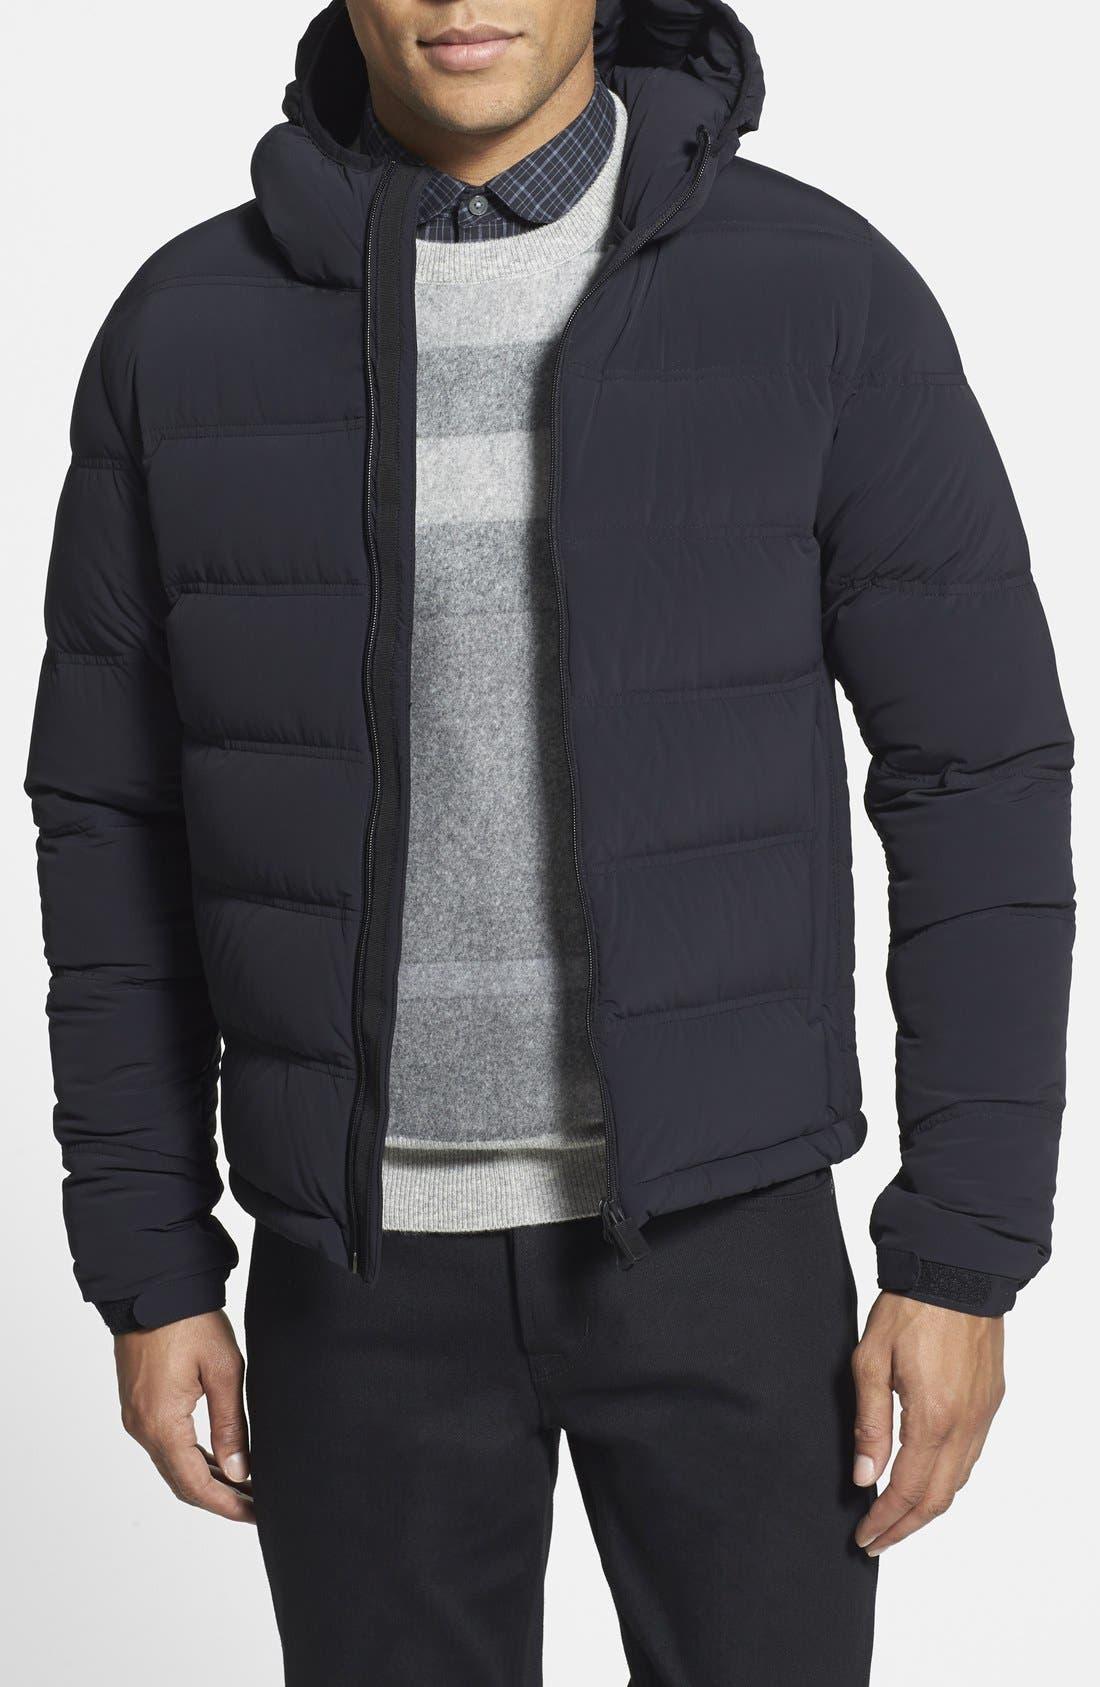 ASPESI,                             'Elastico' Trim Fit Hooded Puffer Jacket,                             Main thumbnail 1, color,                             001